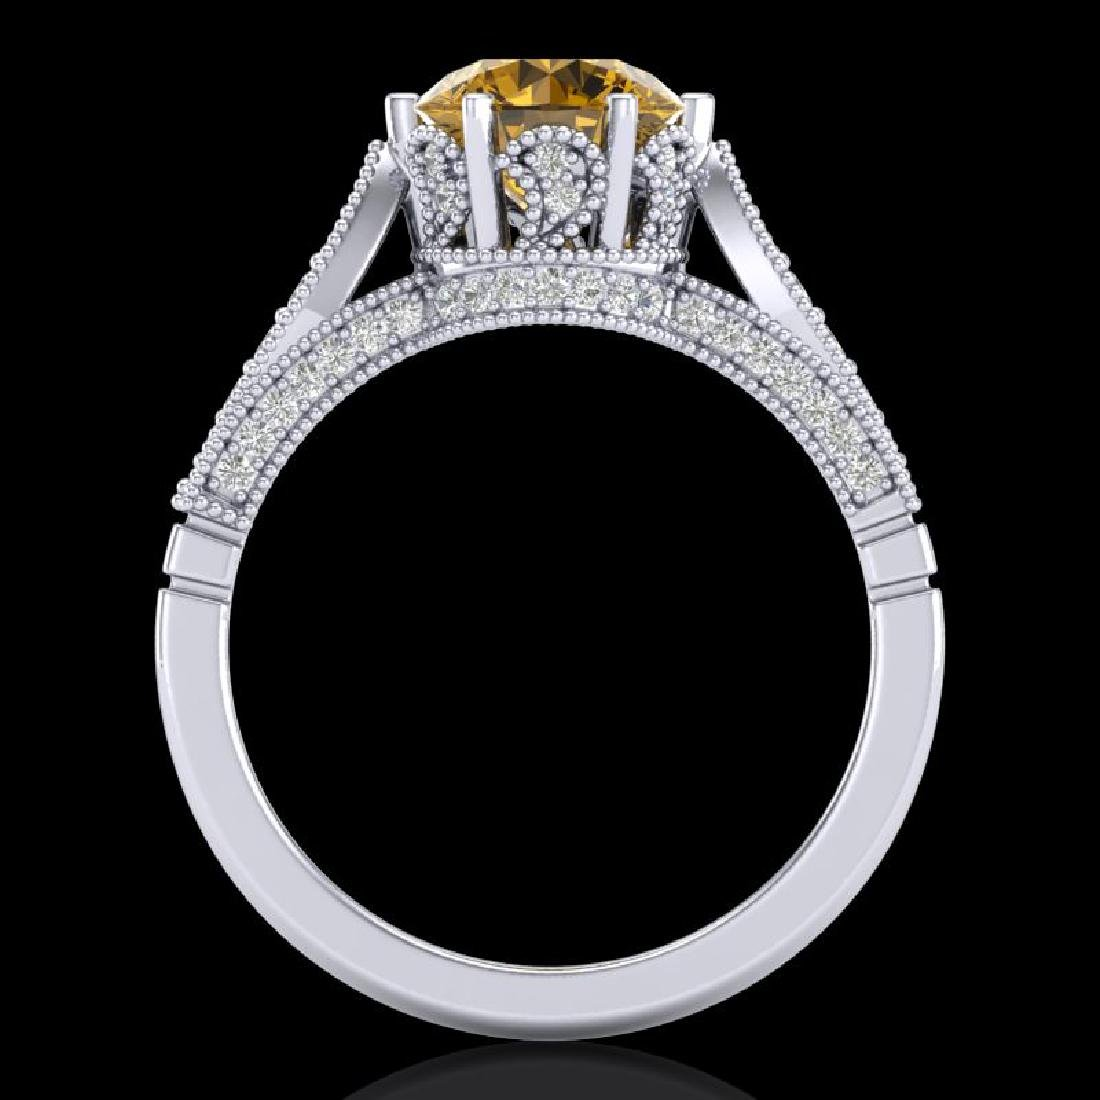 2.2 CTW Intense Fancy Yellow Diamond Engagement Art - 3